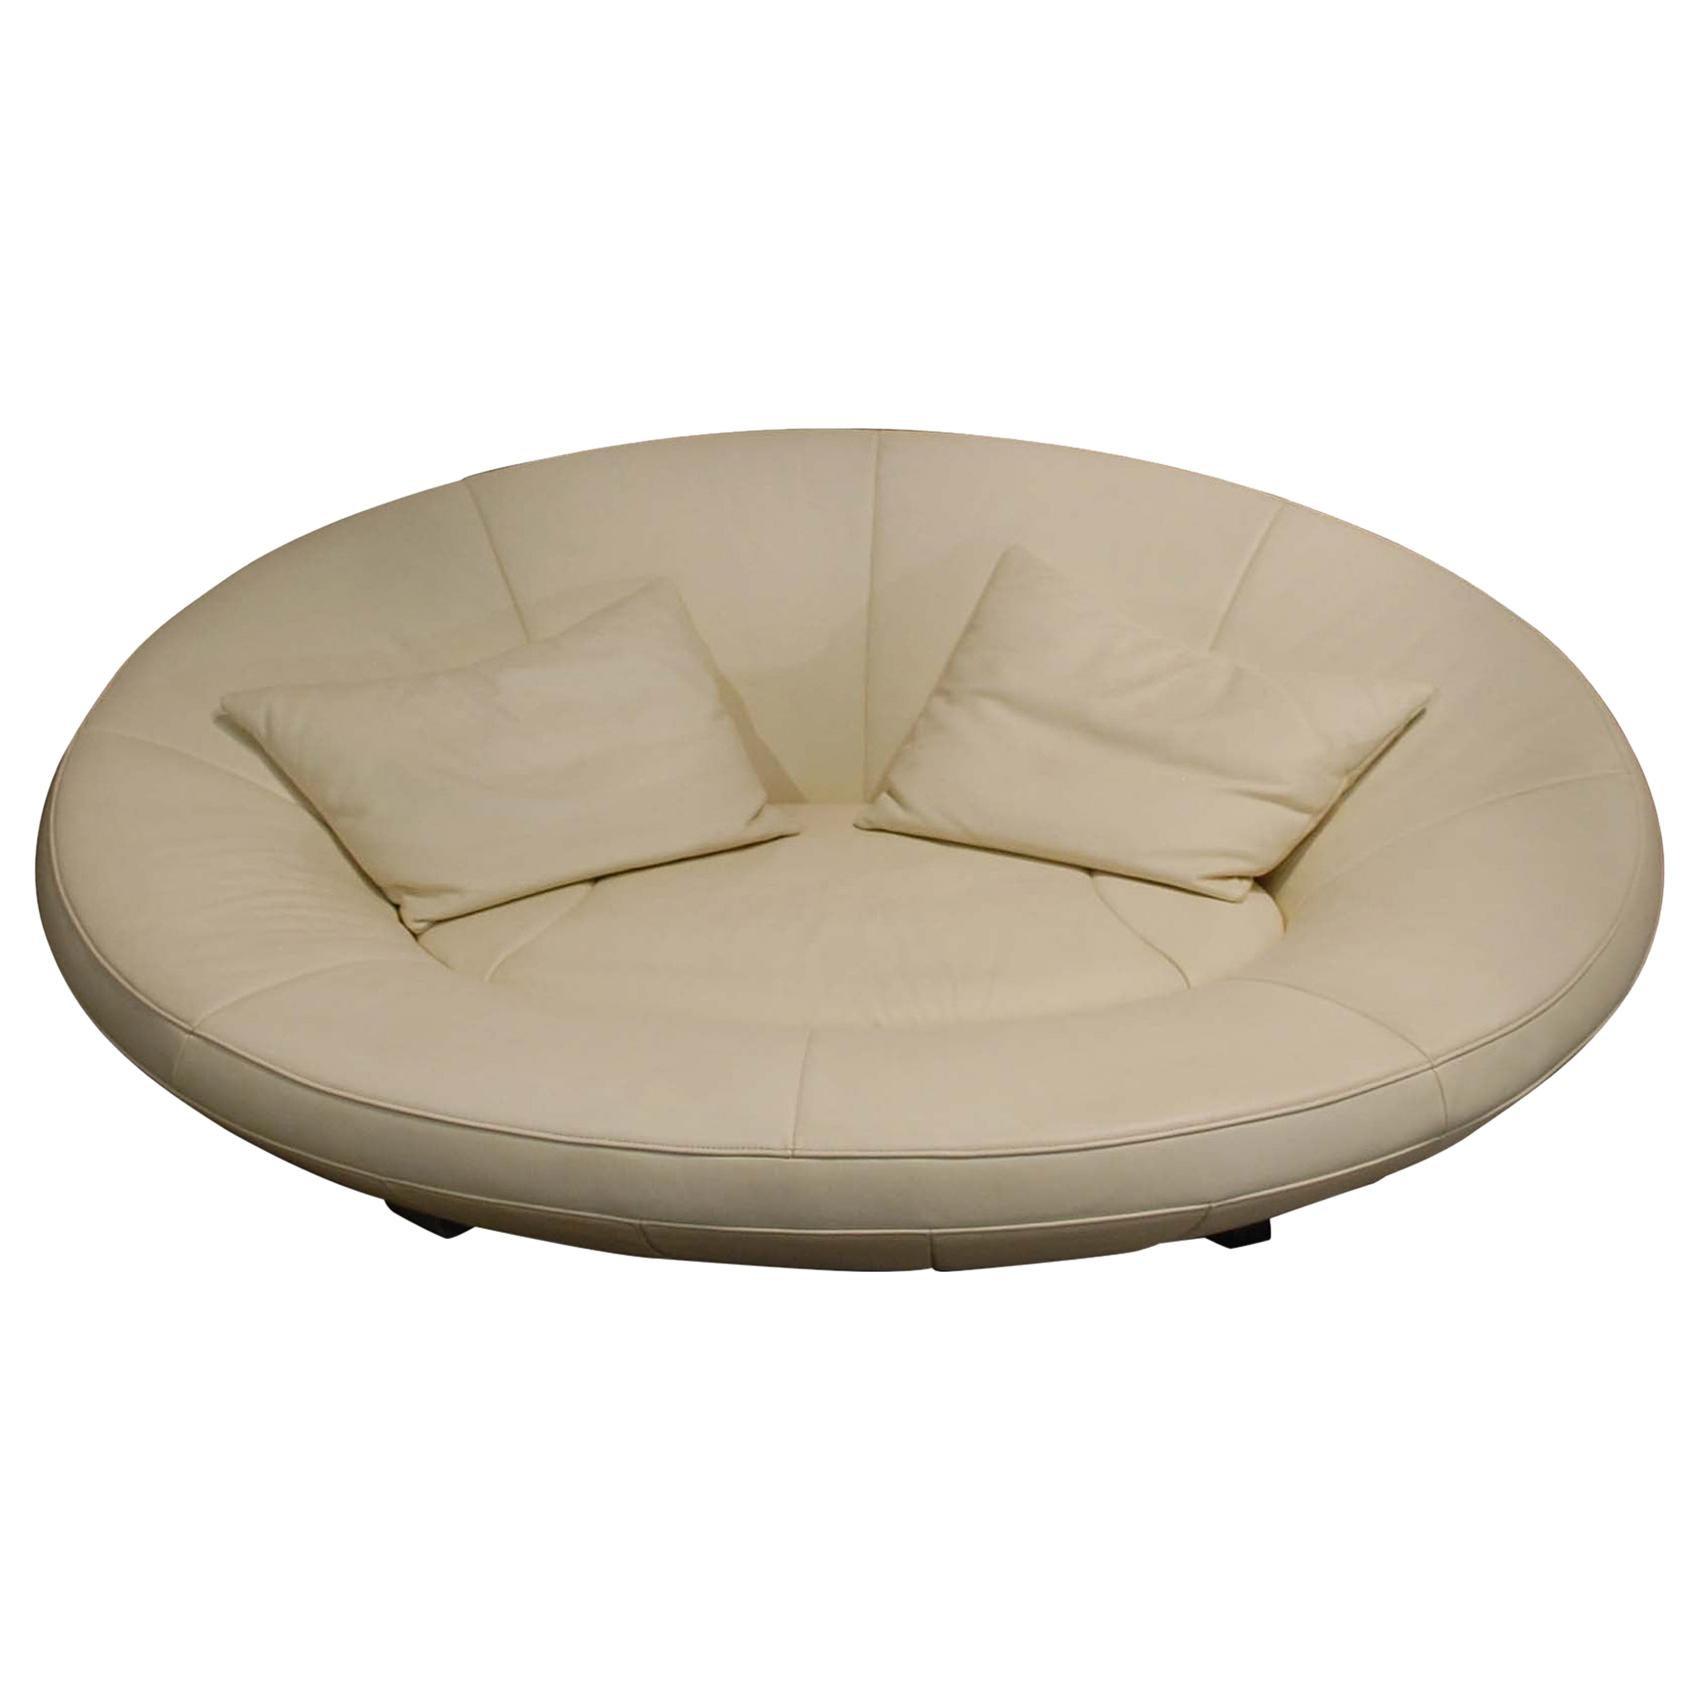 De Sede DS 152 Oval White Leather Sofa by Jane Worthington for De Sede